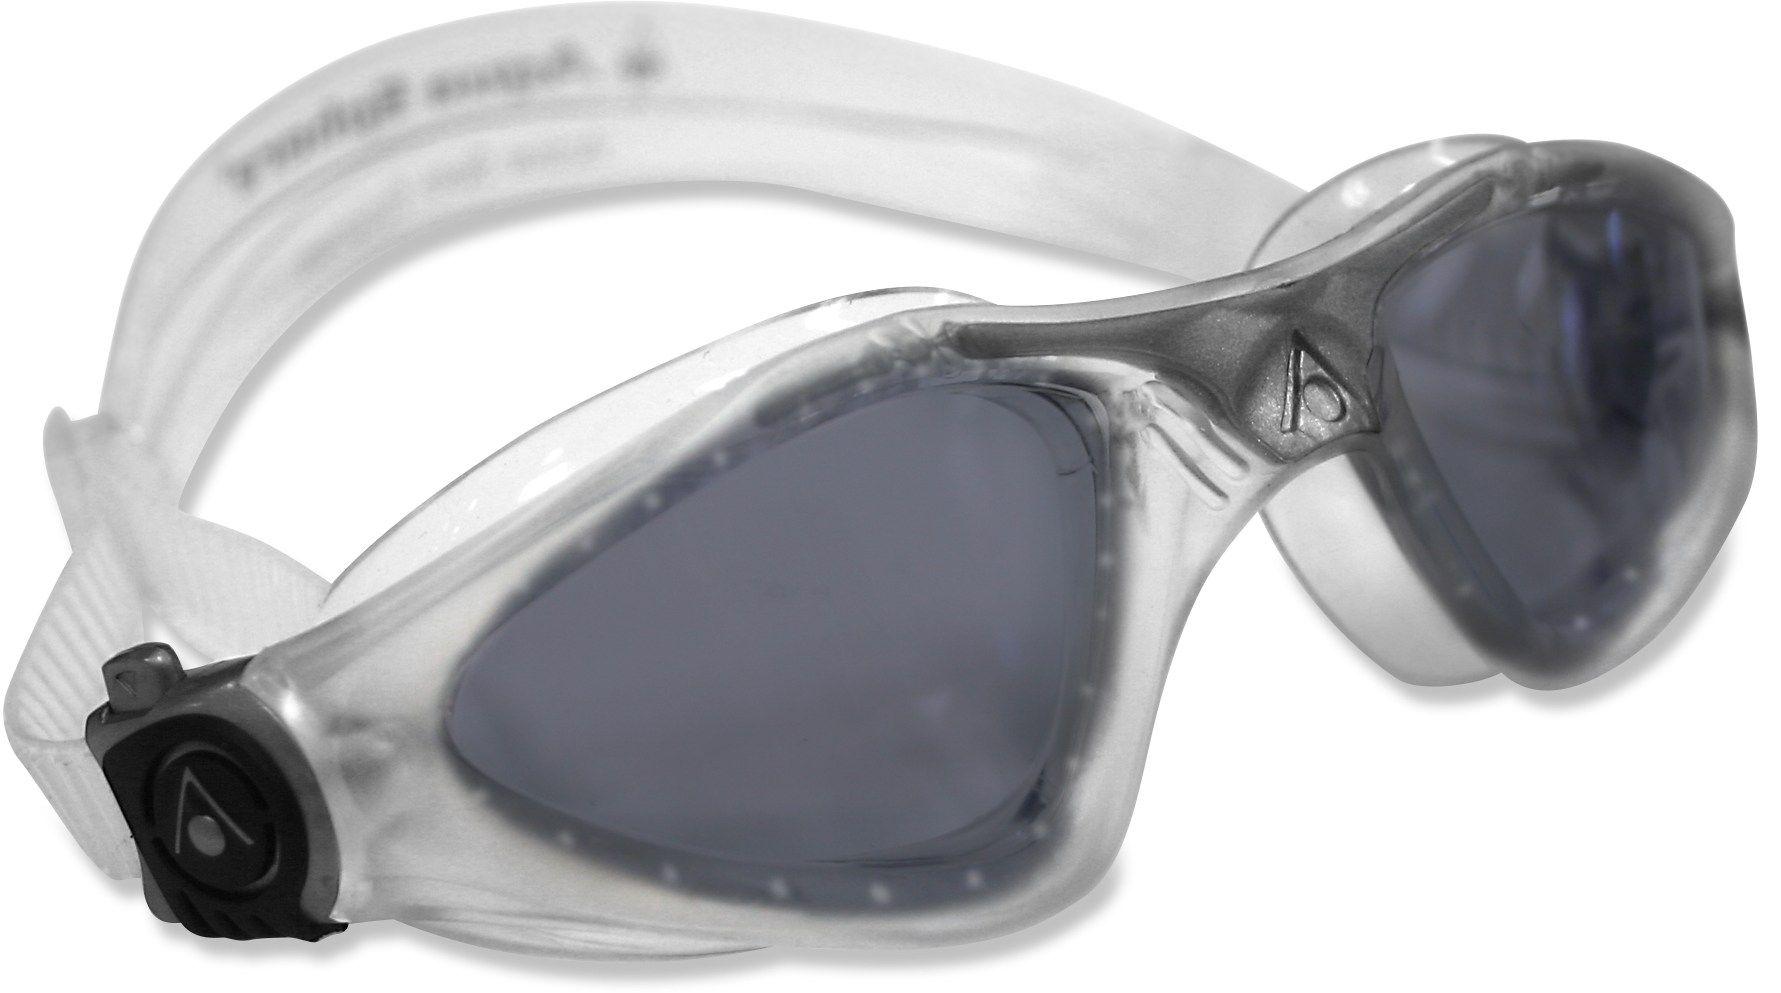 7b14fc394d11 Aqua Sphere Male Kayenne Smoke Lens Swim Goggles - Men s